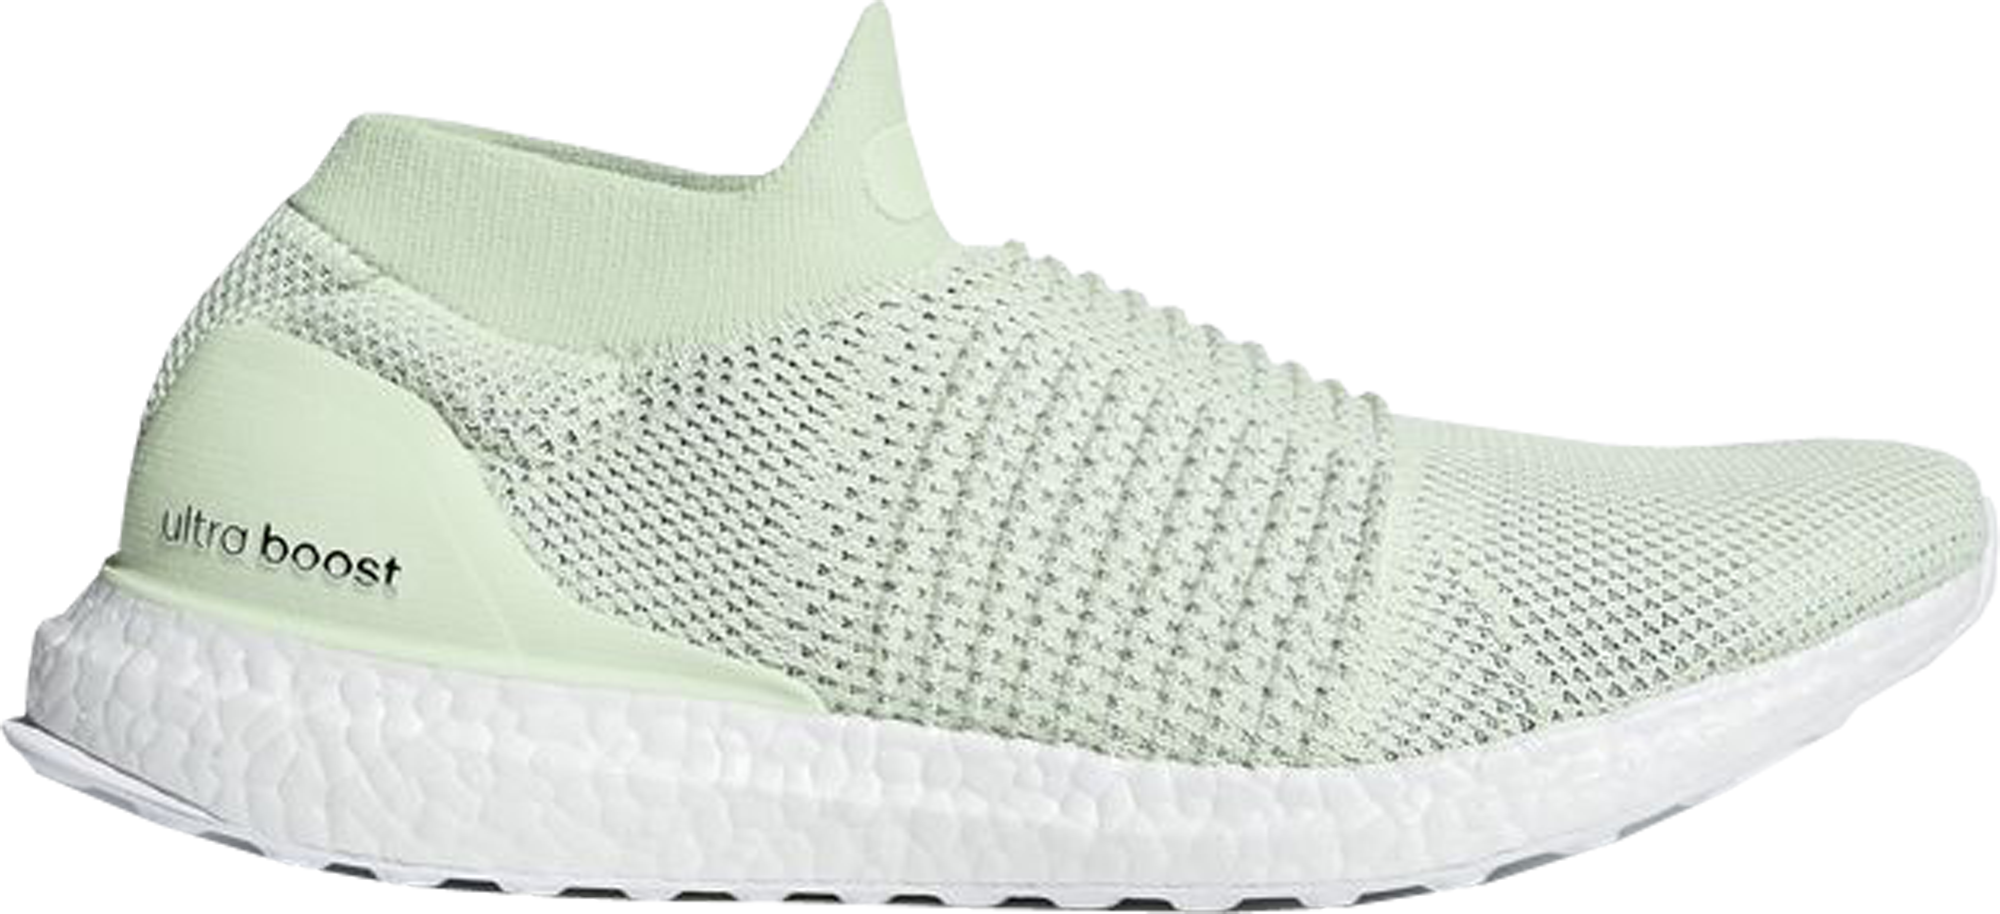 adidas Ultra Boost Laceless Mid Ash Green